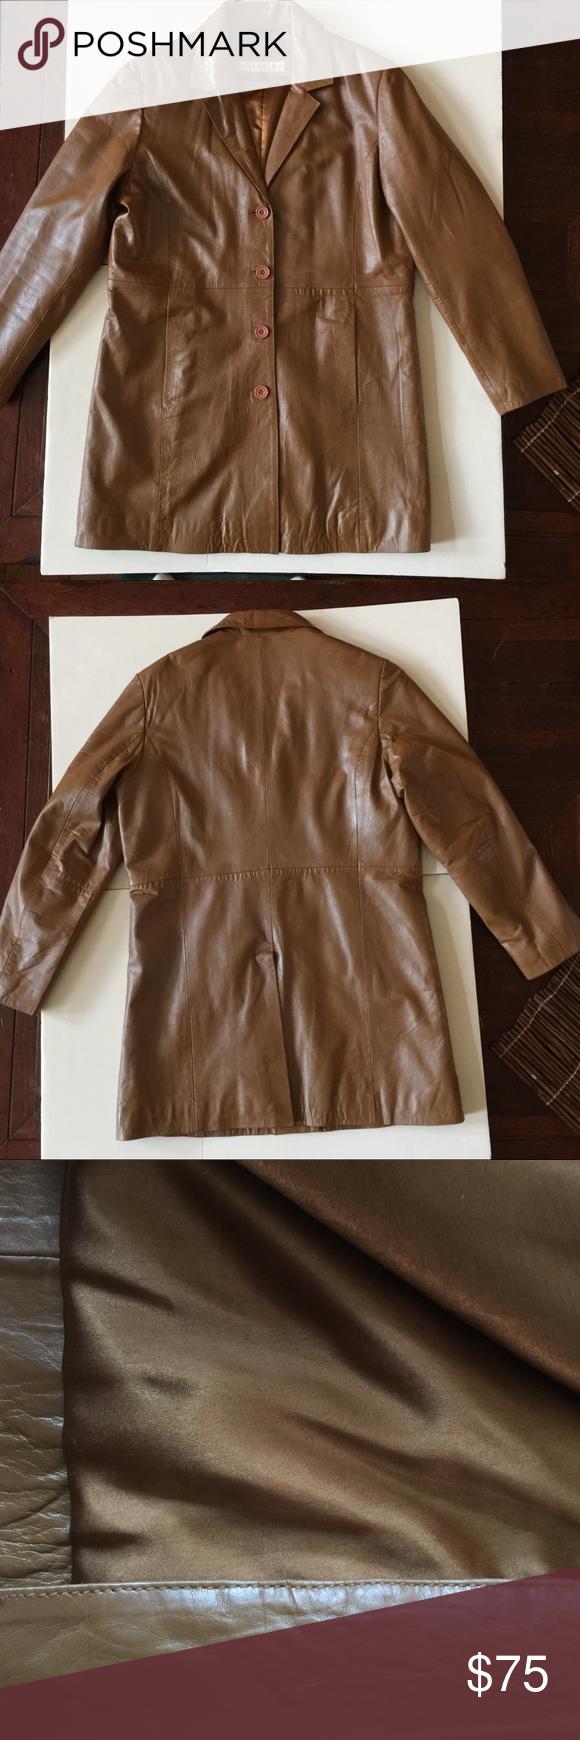 Vintage Excelled Leather Jacket Brown Large Leather Jacket Brown Leather Jacket Jackets [ 1740 x 580 Pixel ]